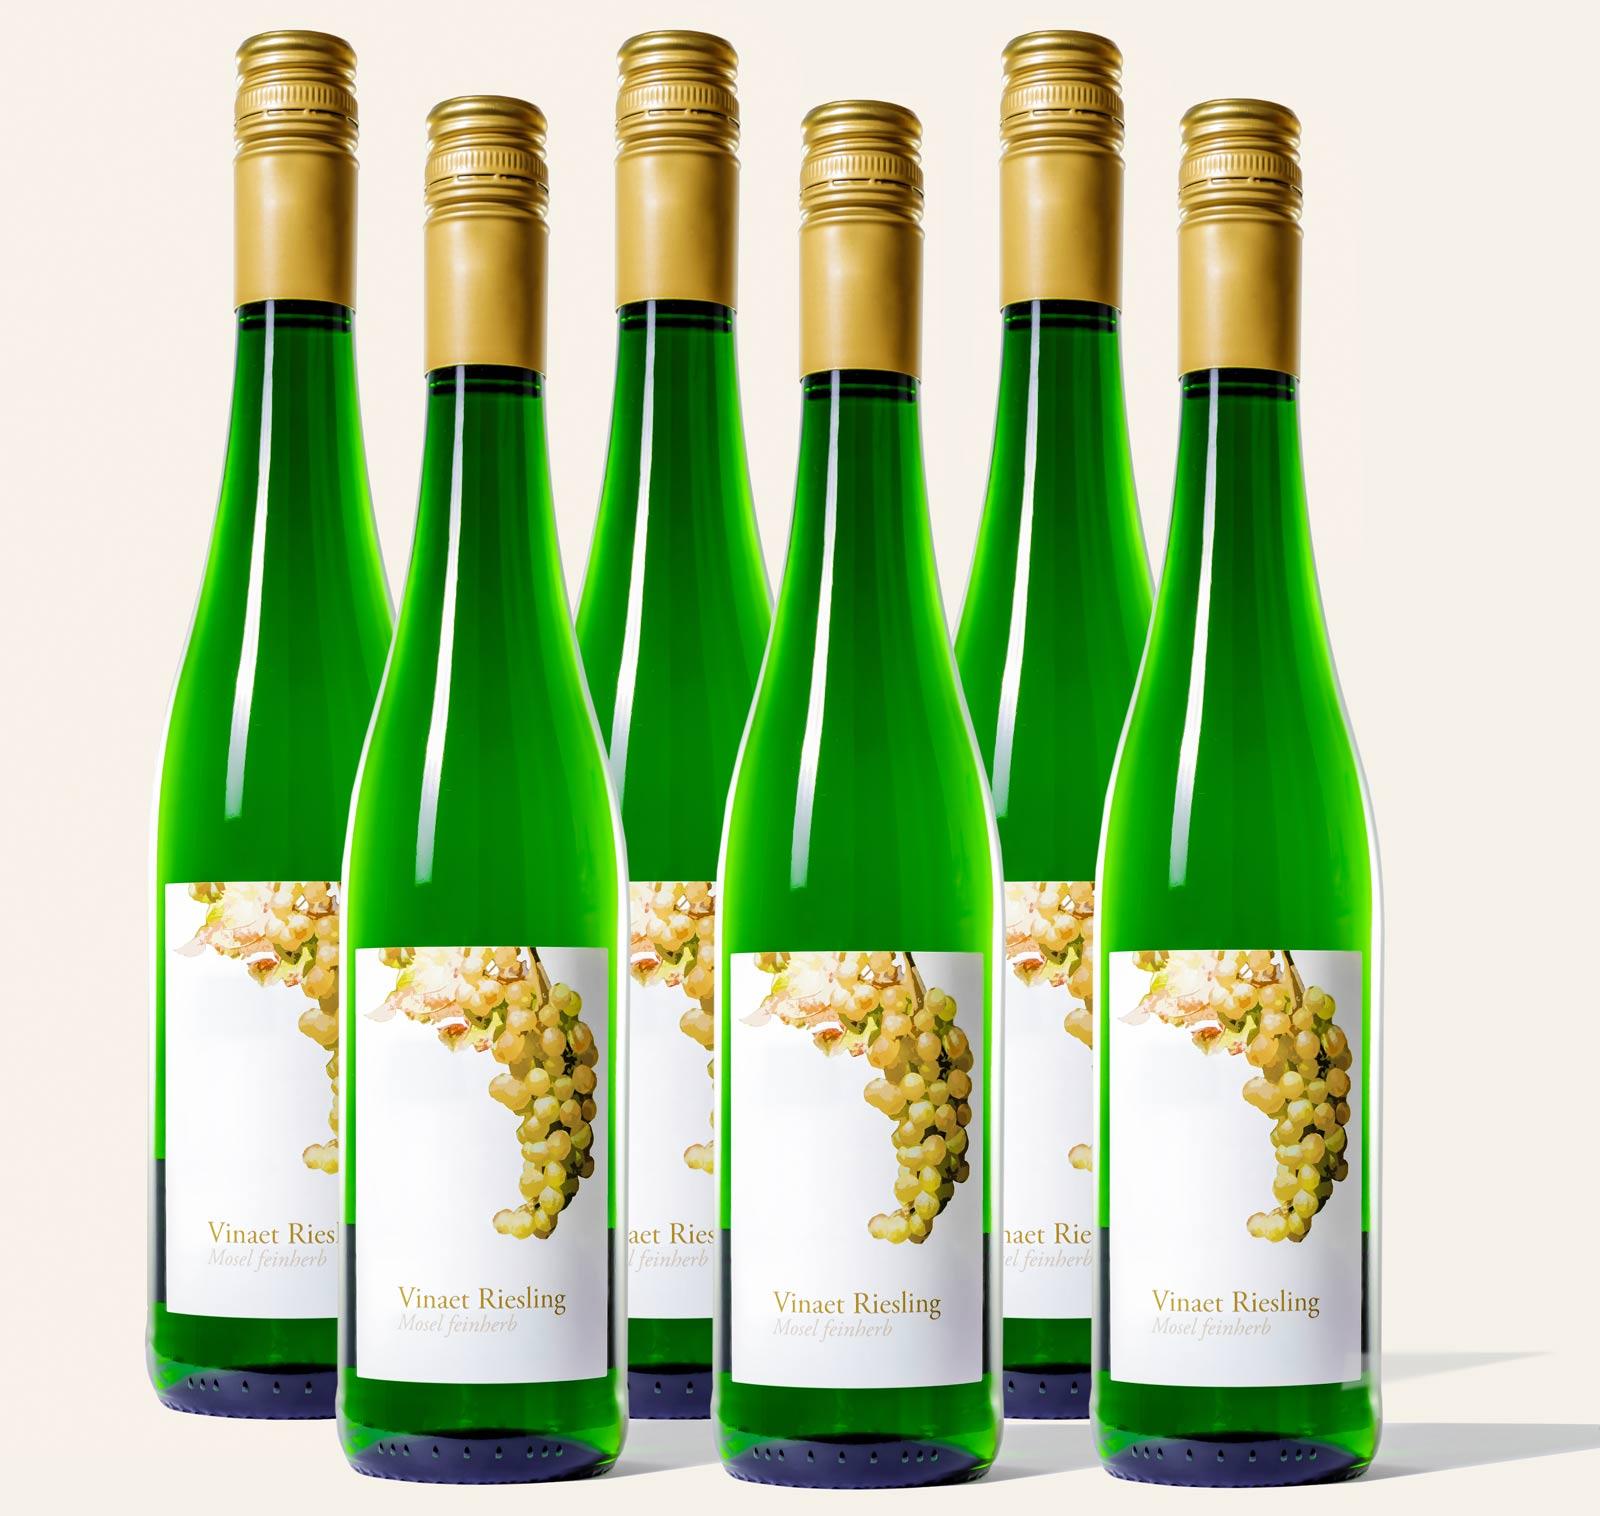 Sechs Vinaet Mosel Riesling 2019 feinherb 6er Paket Weinflaschen der Marke Vinaet